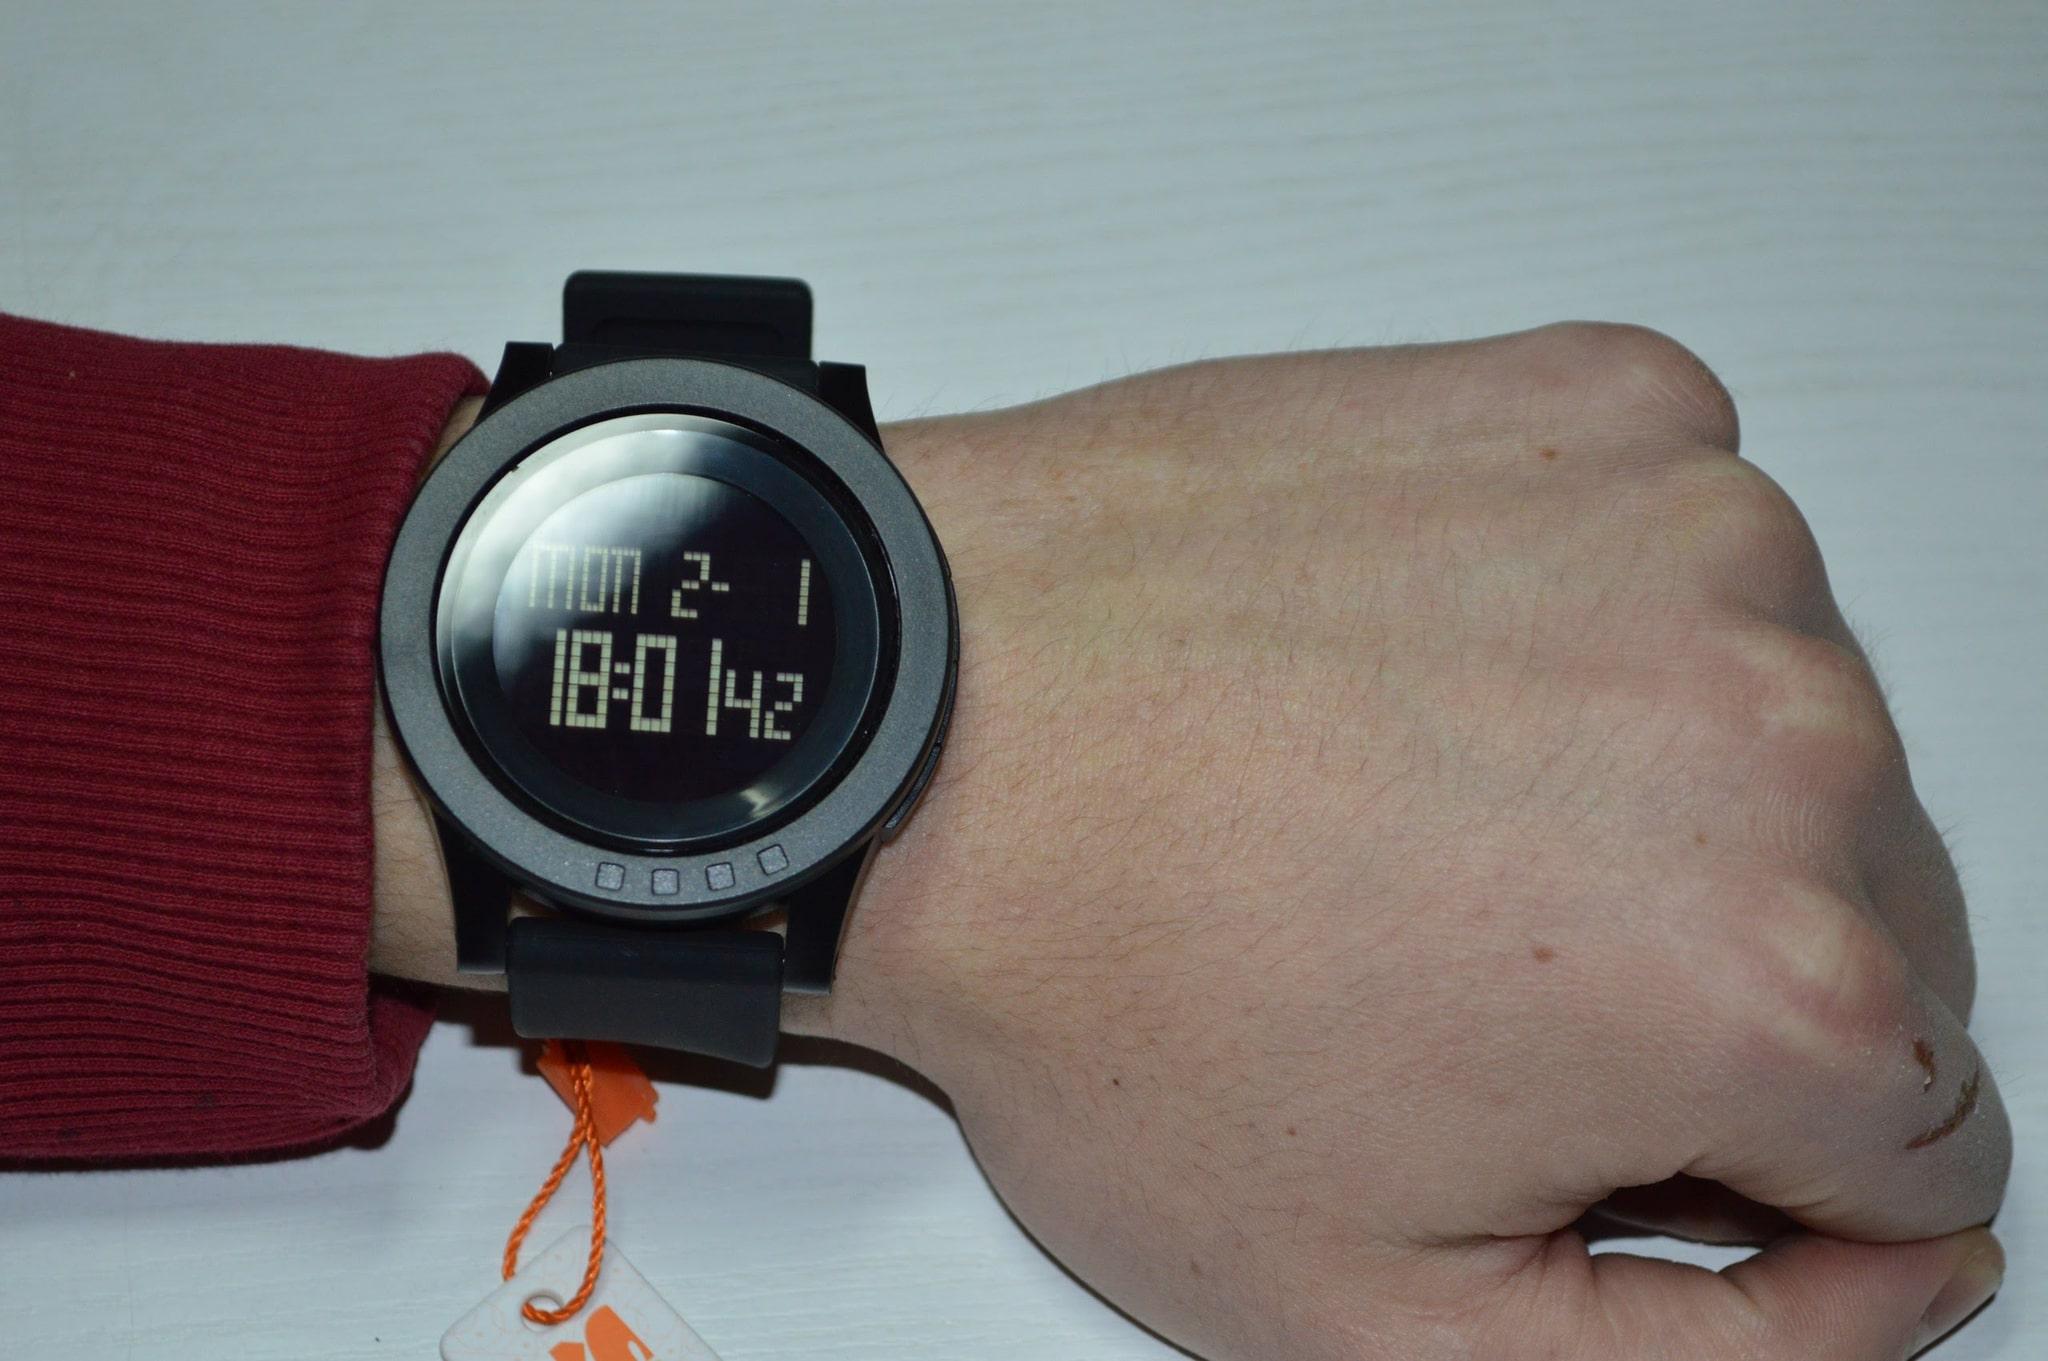 Jam Tangan Pria Original Skmei Fosil Casio LED Model g shock suunto